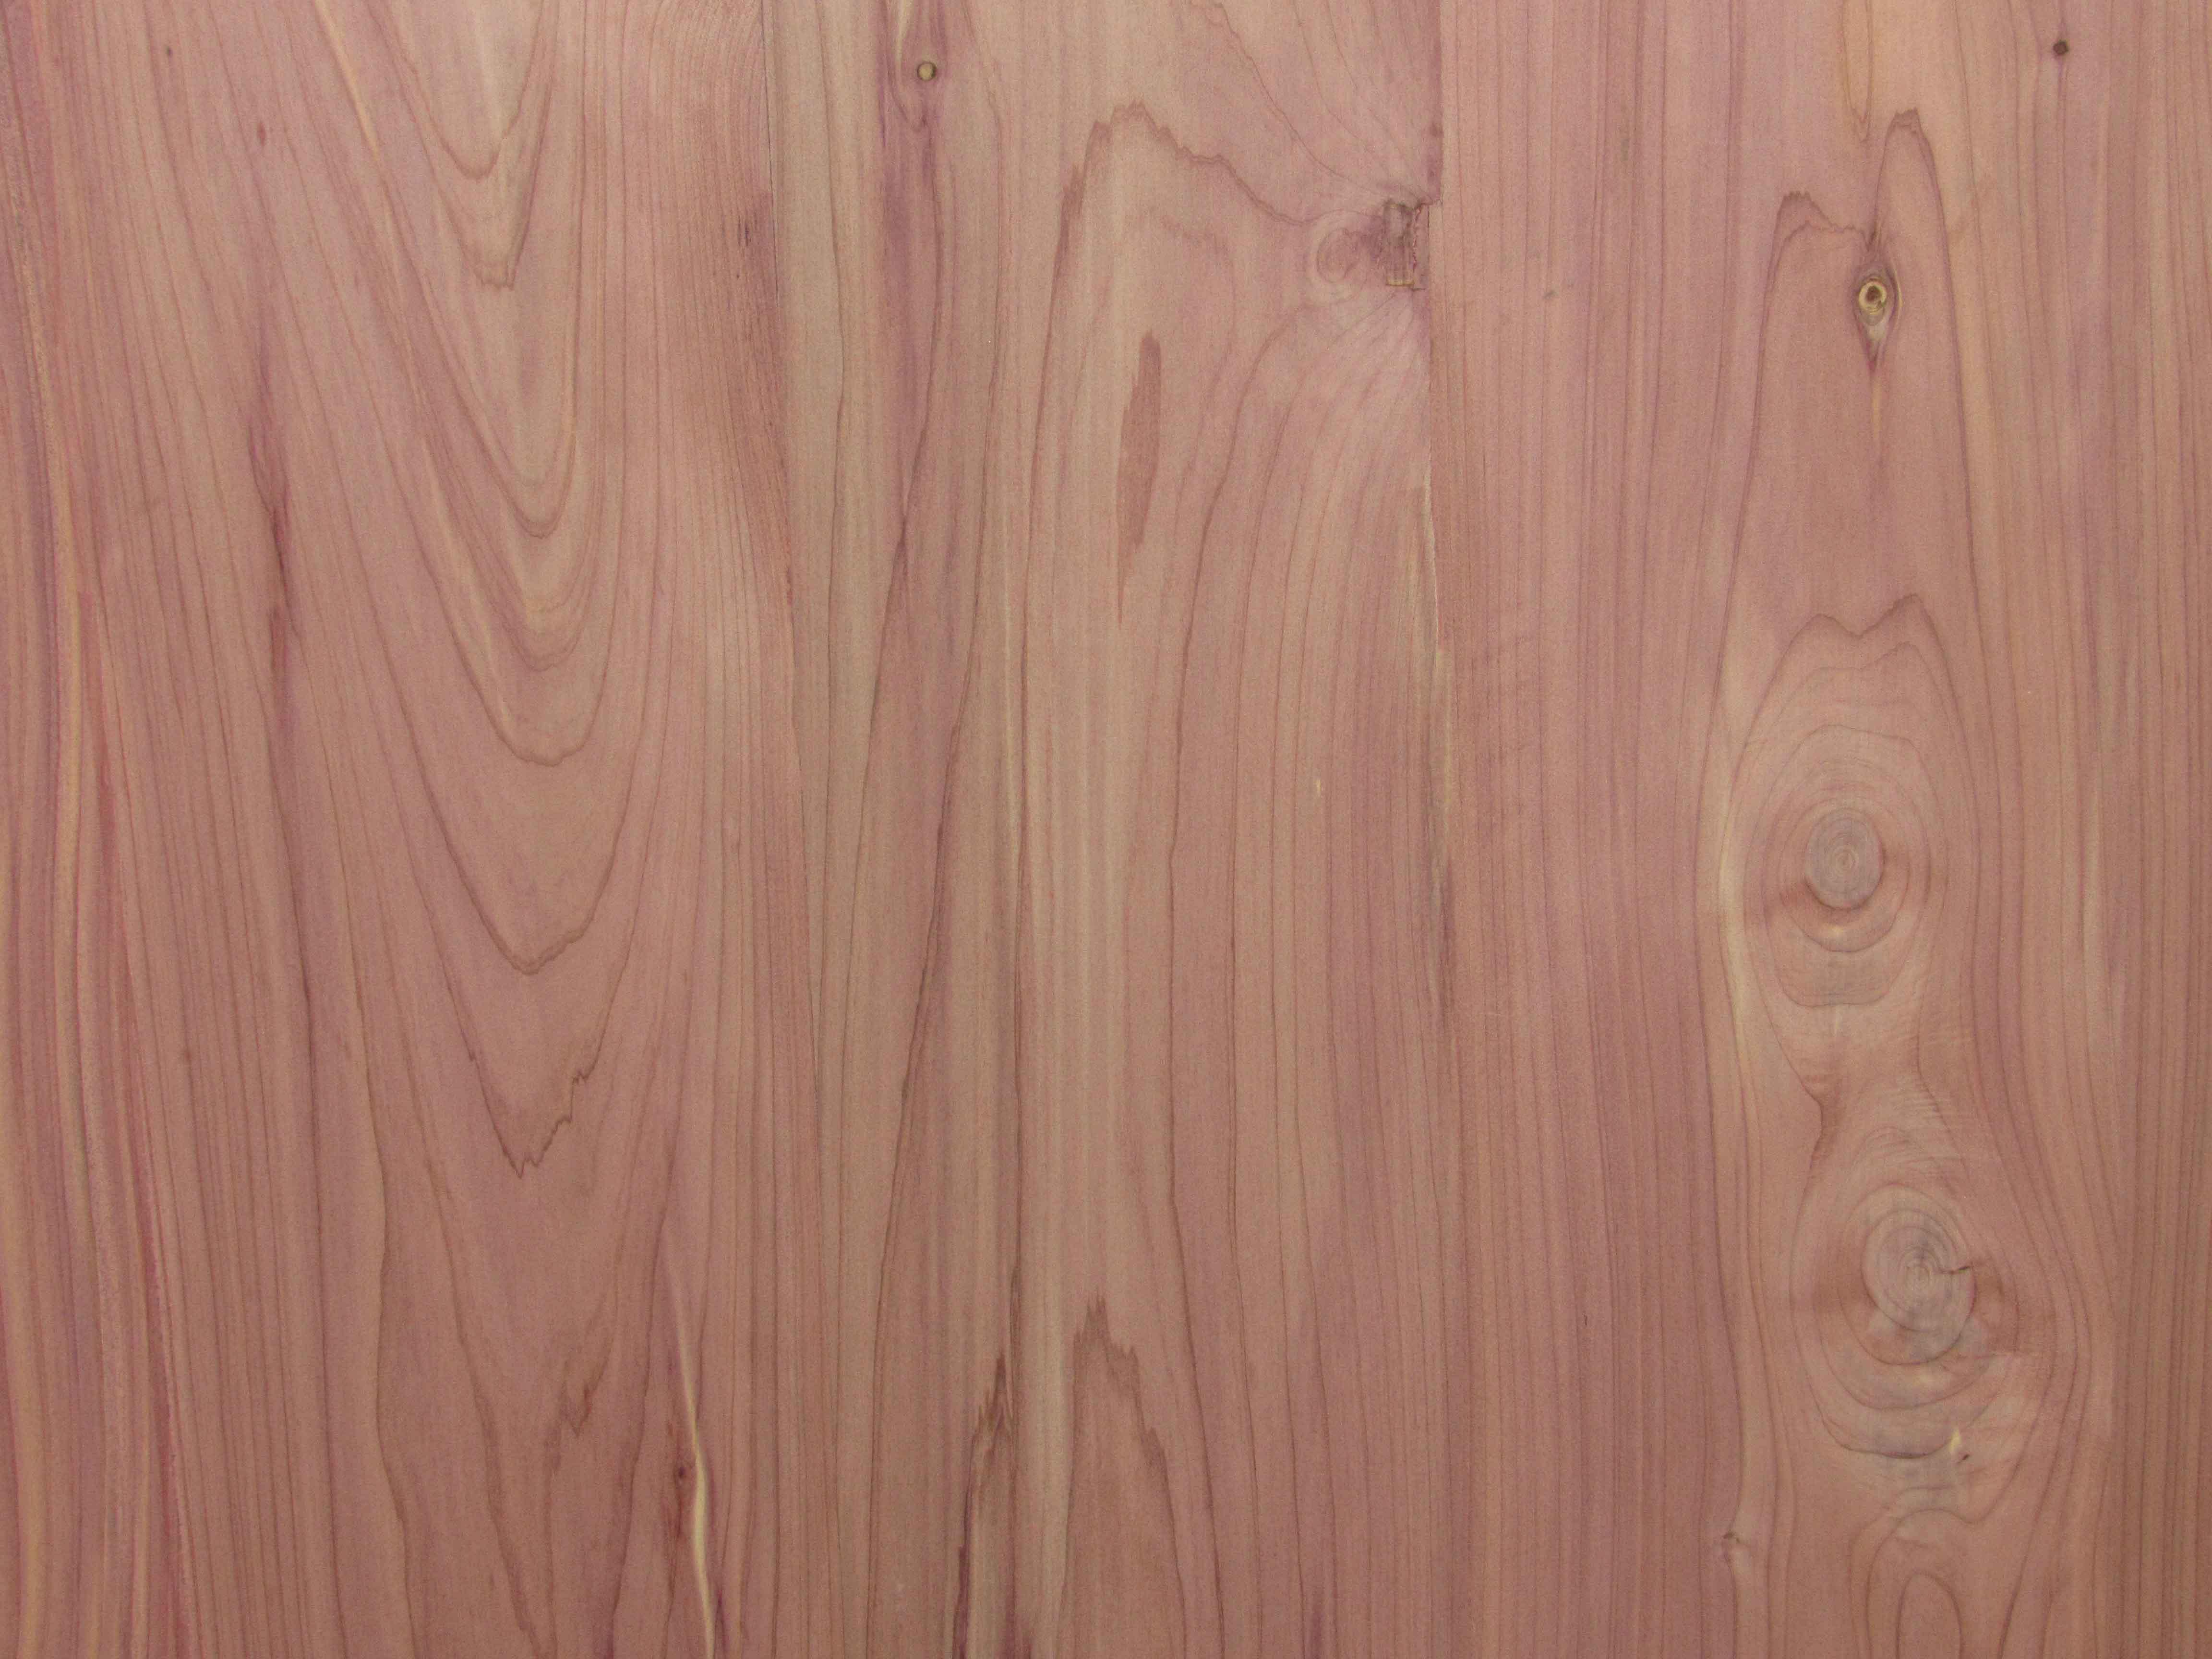 Cedar Wood Sheets Plywood